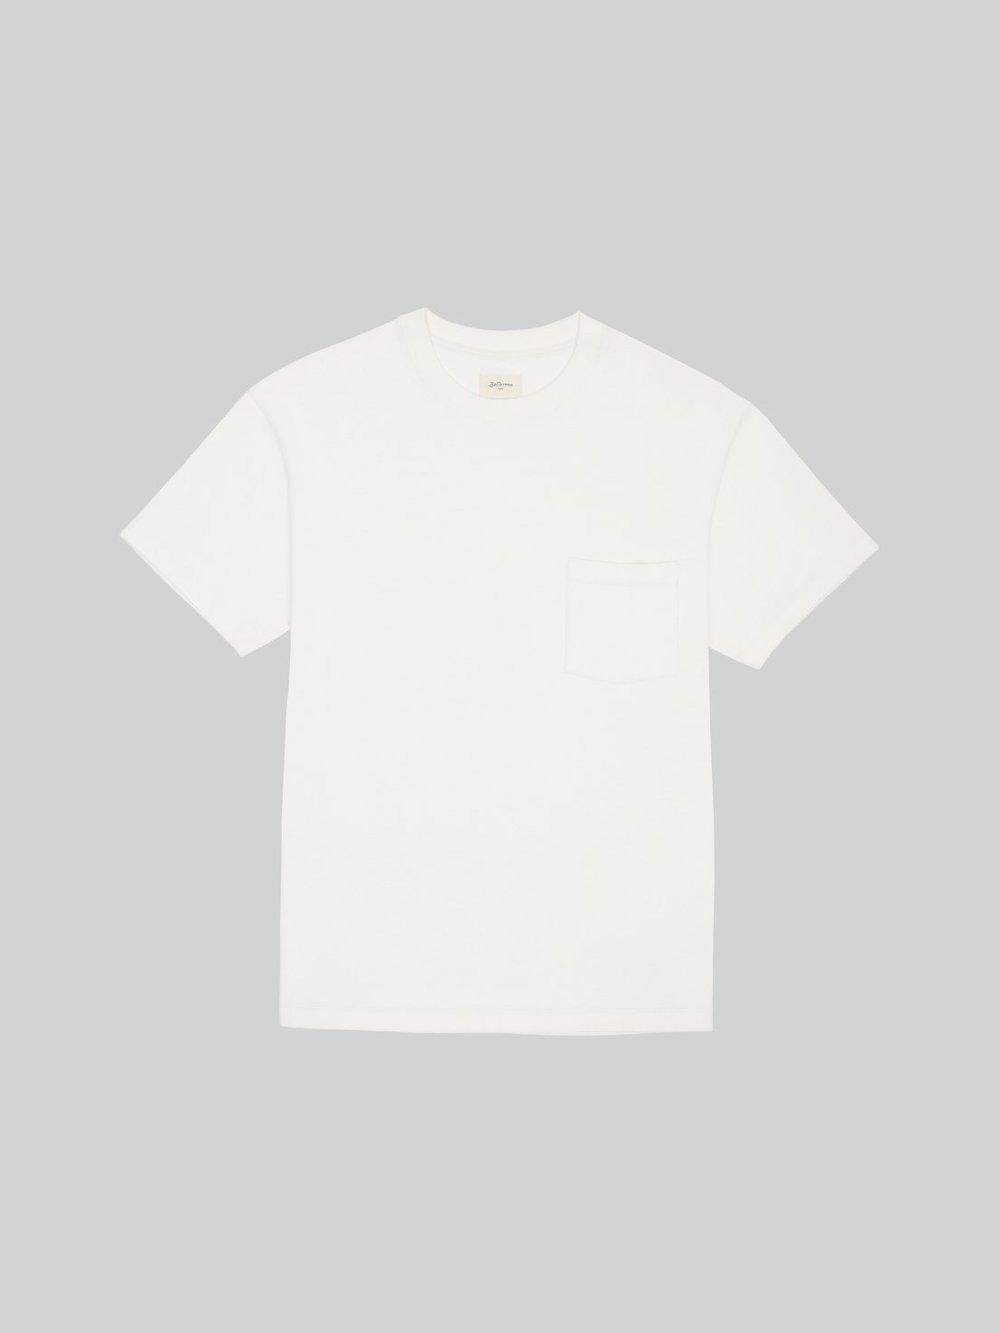 Fliz t-shirt